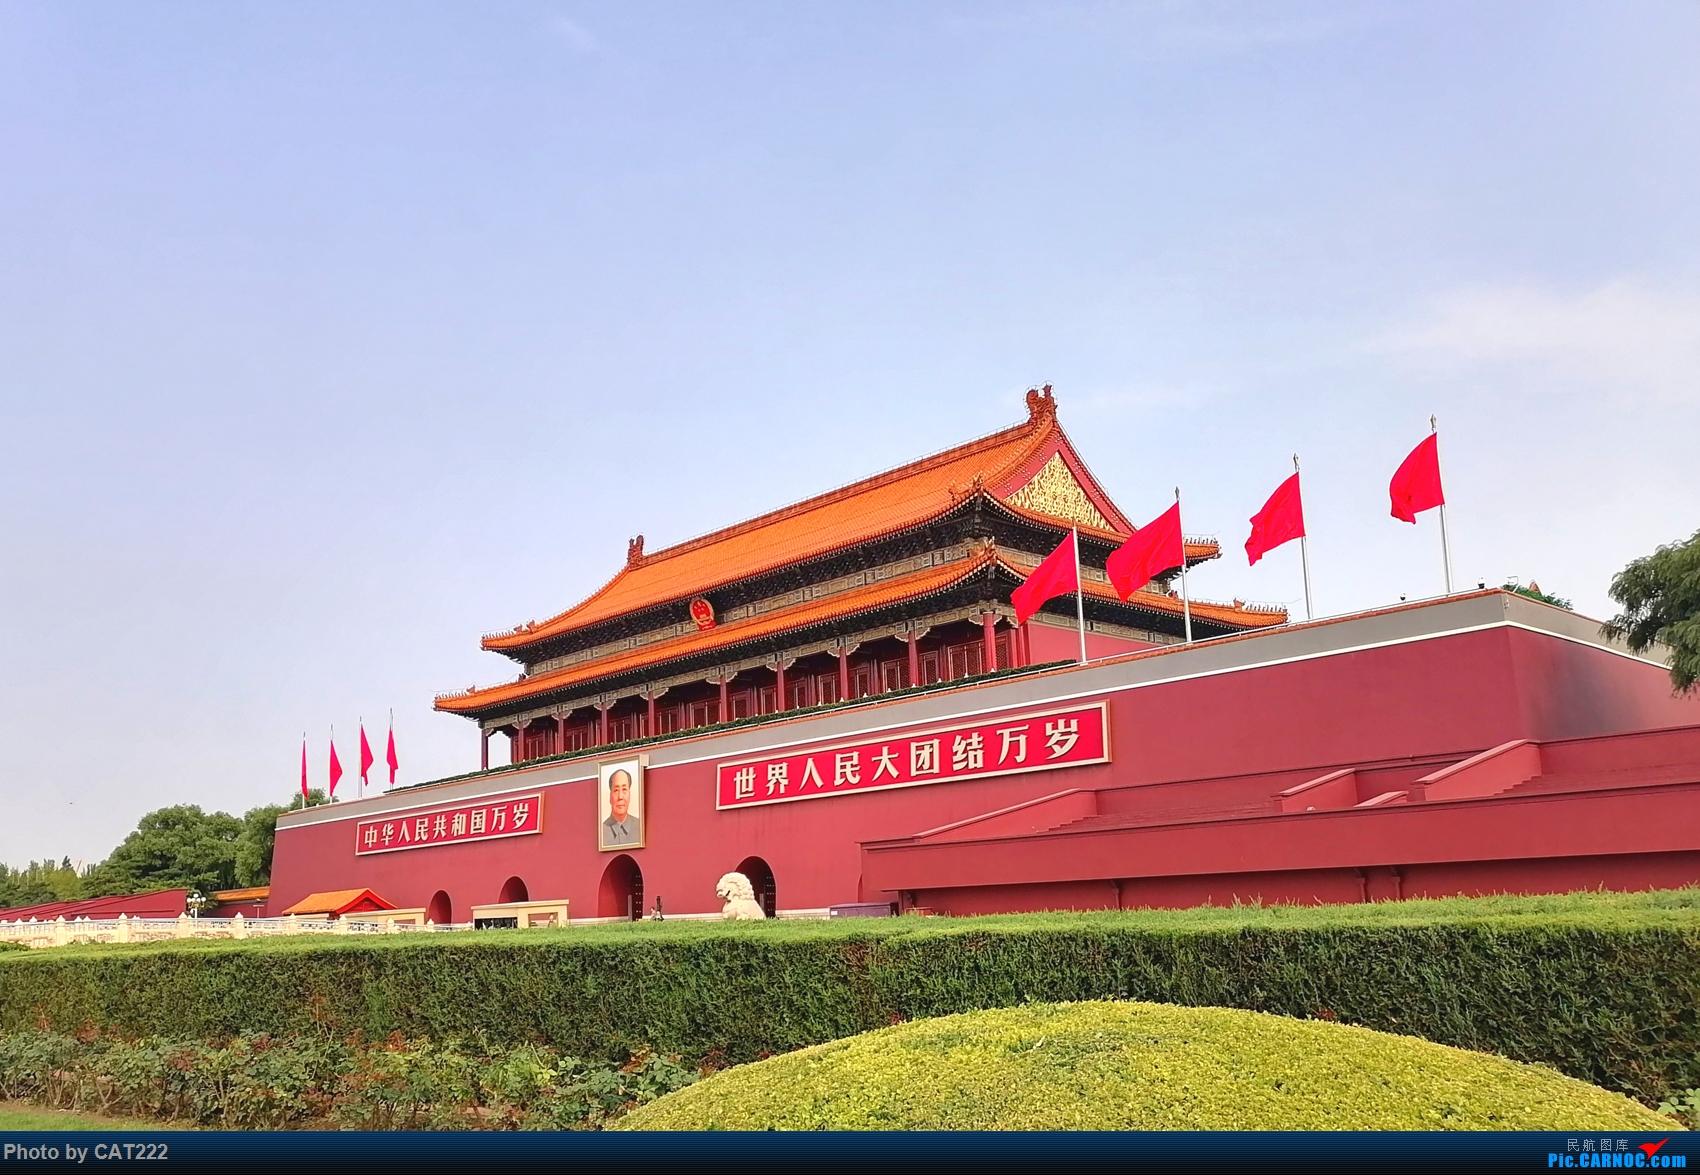 Re:[原创]3天2夜的短暂北京之行,京广线初体验